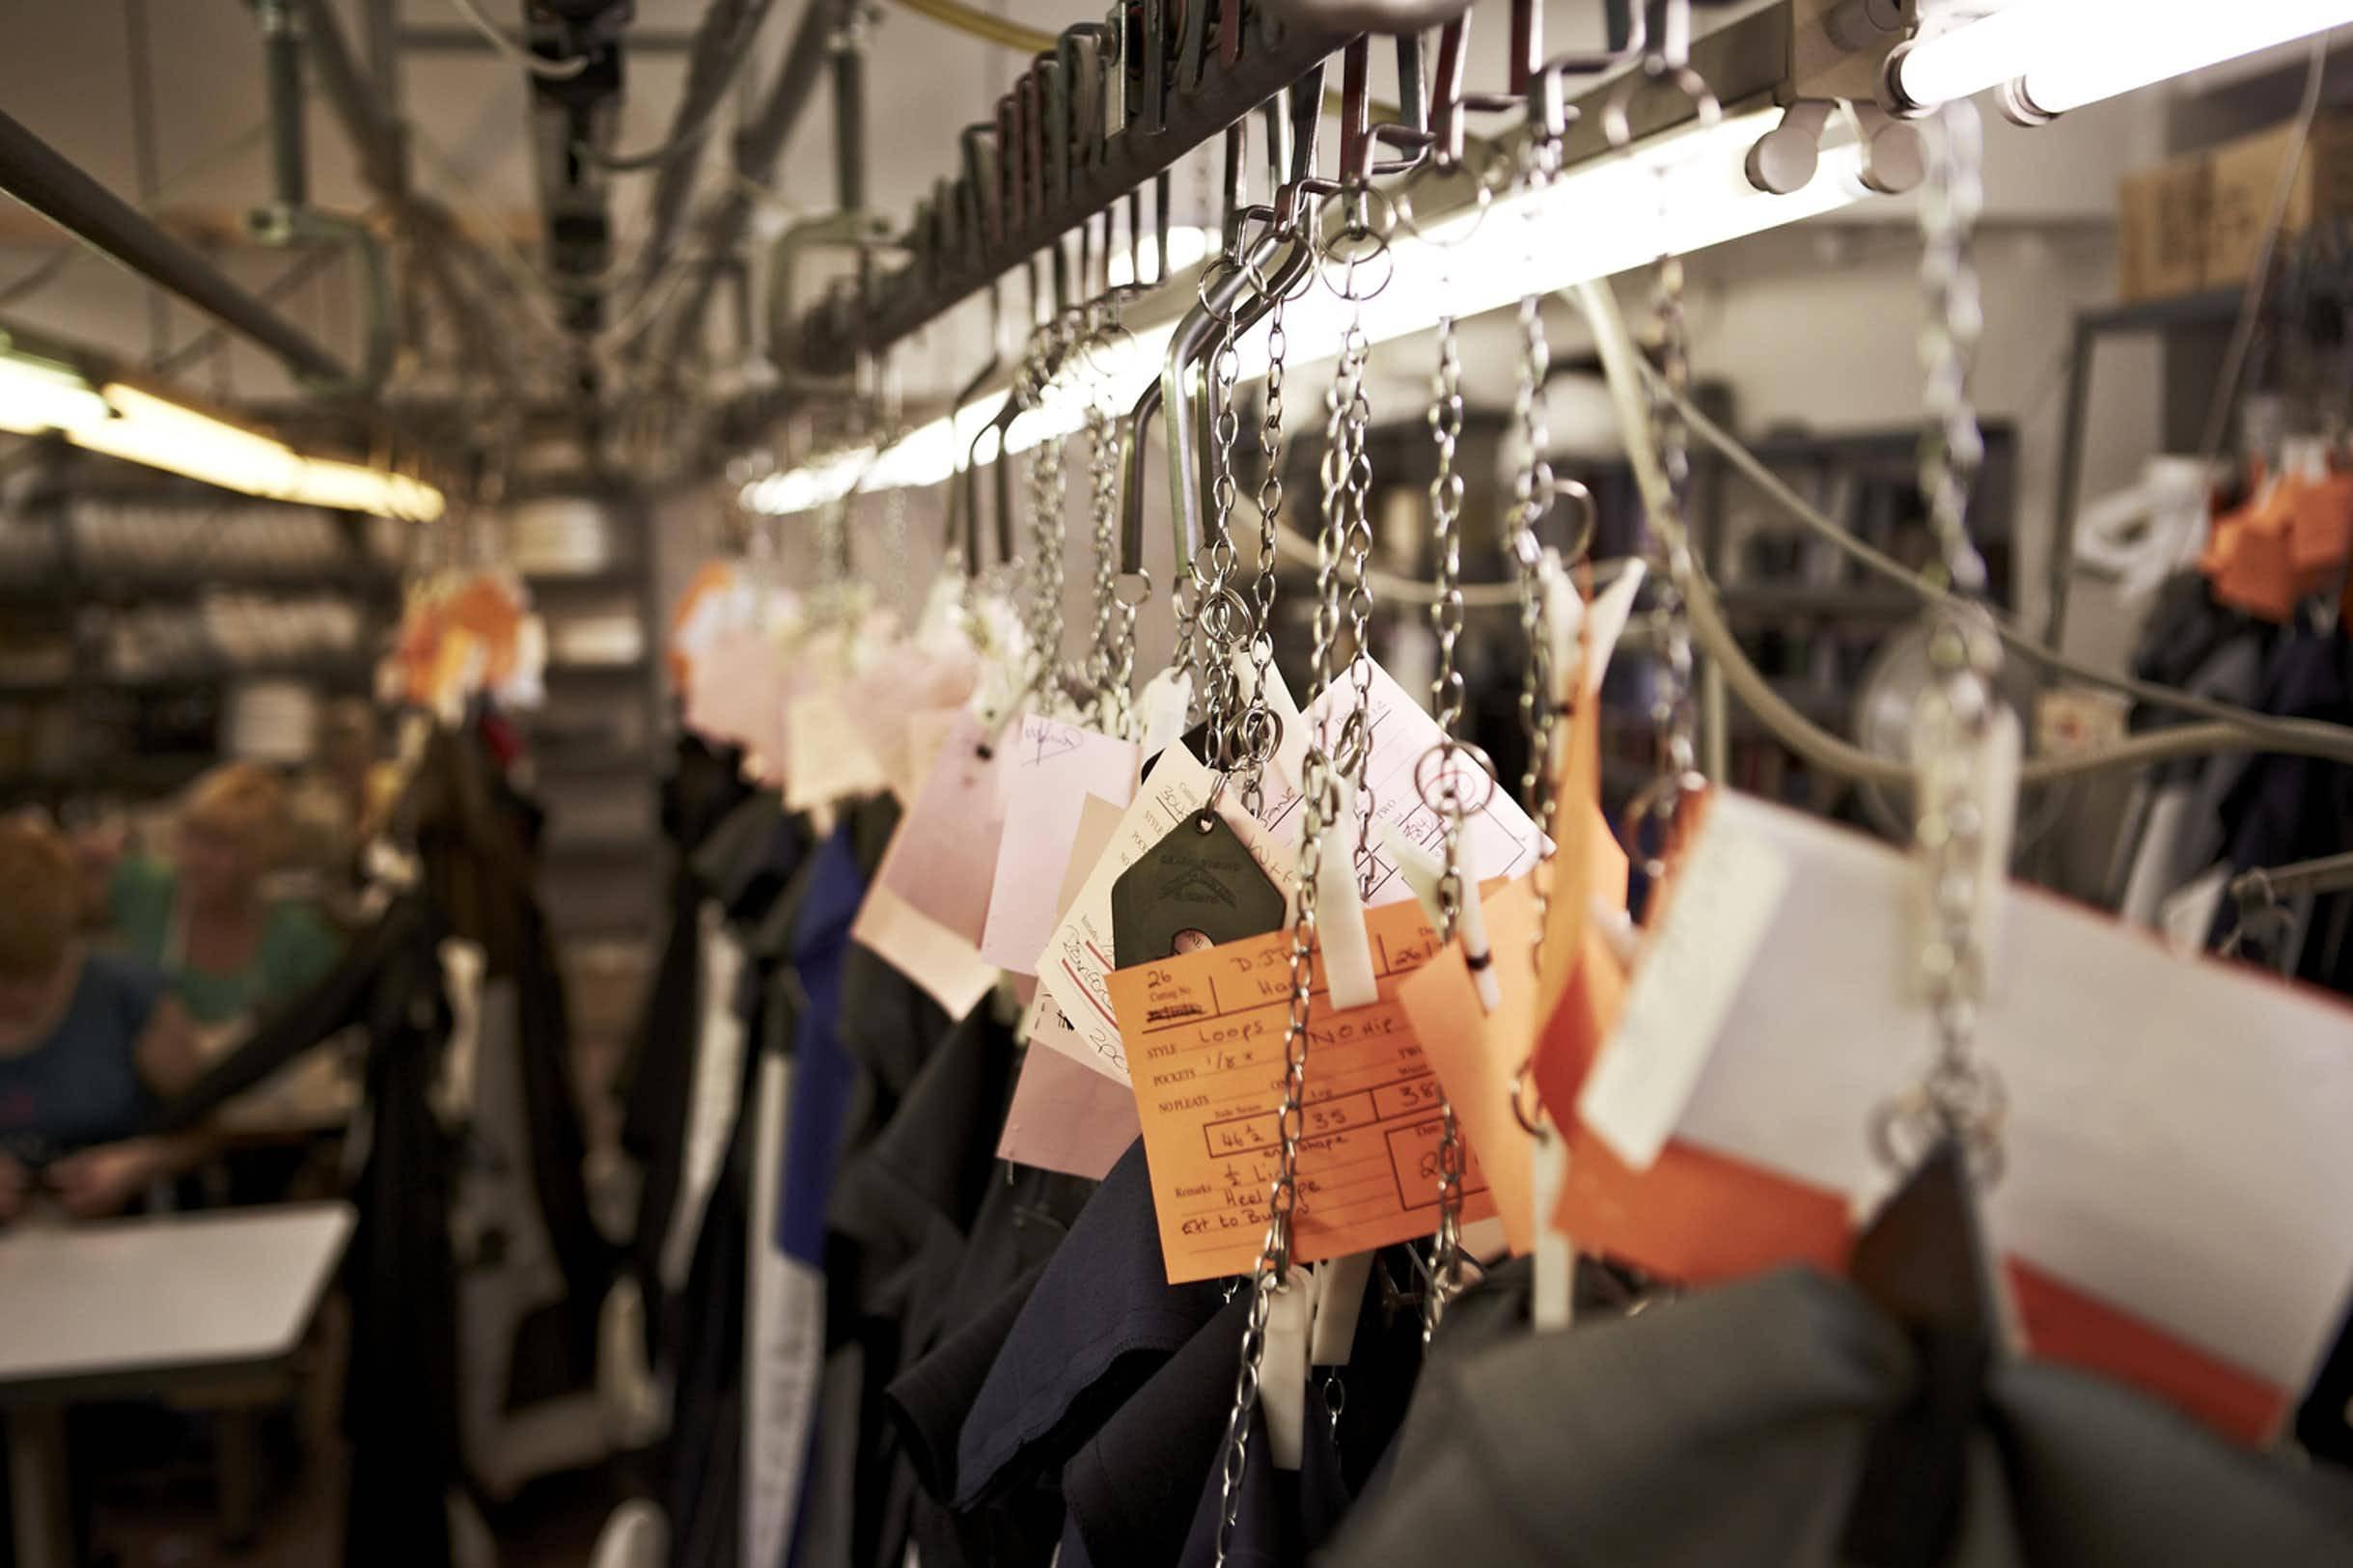 cutting-room-hangers